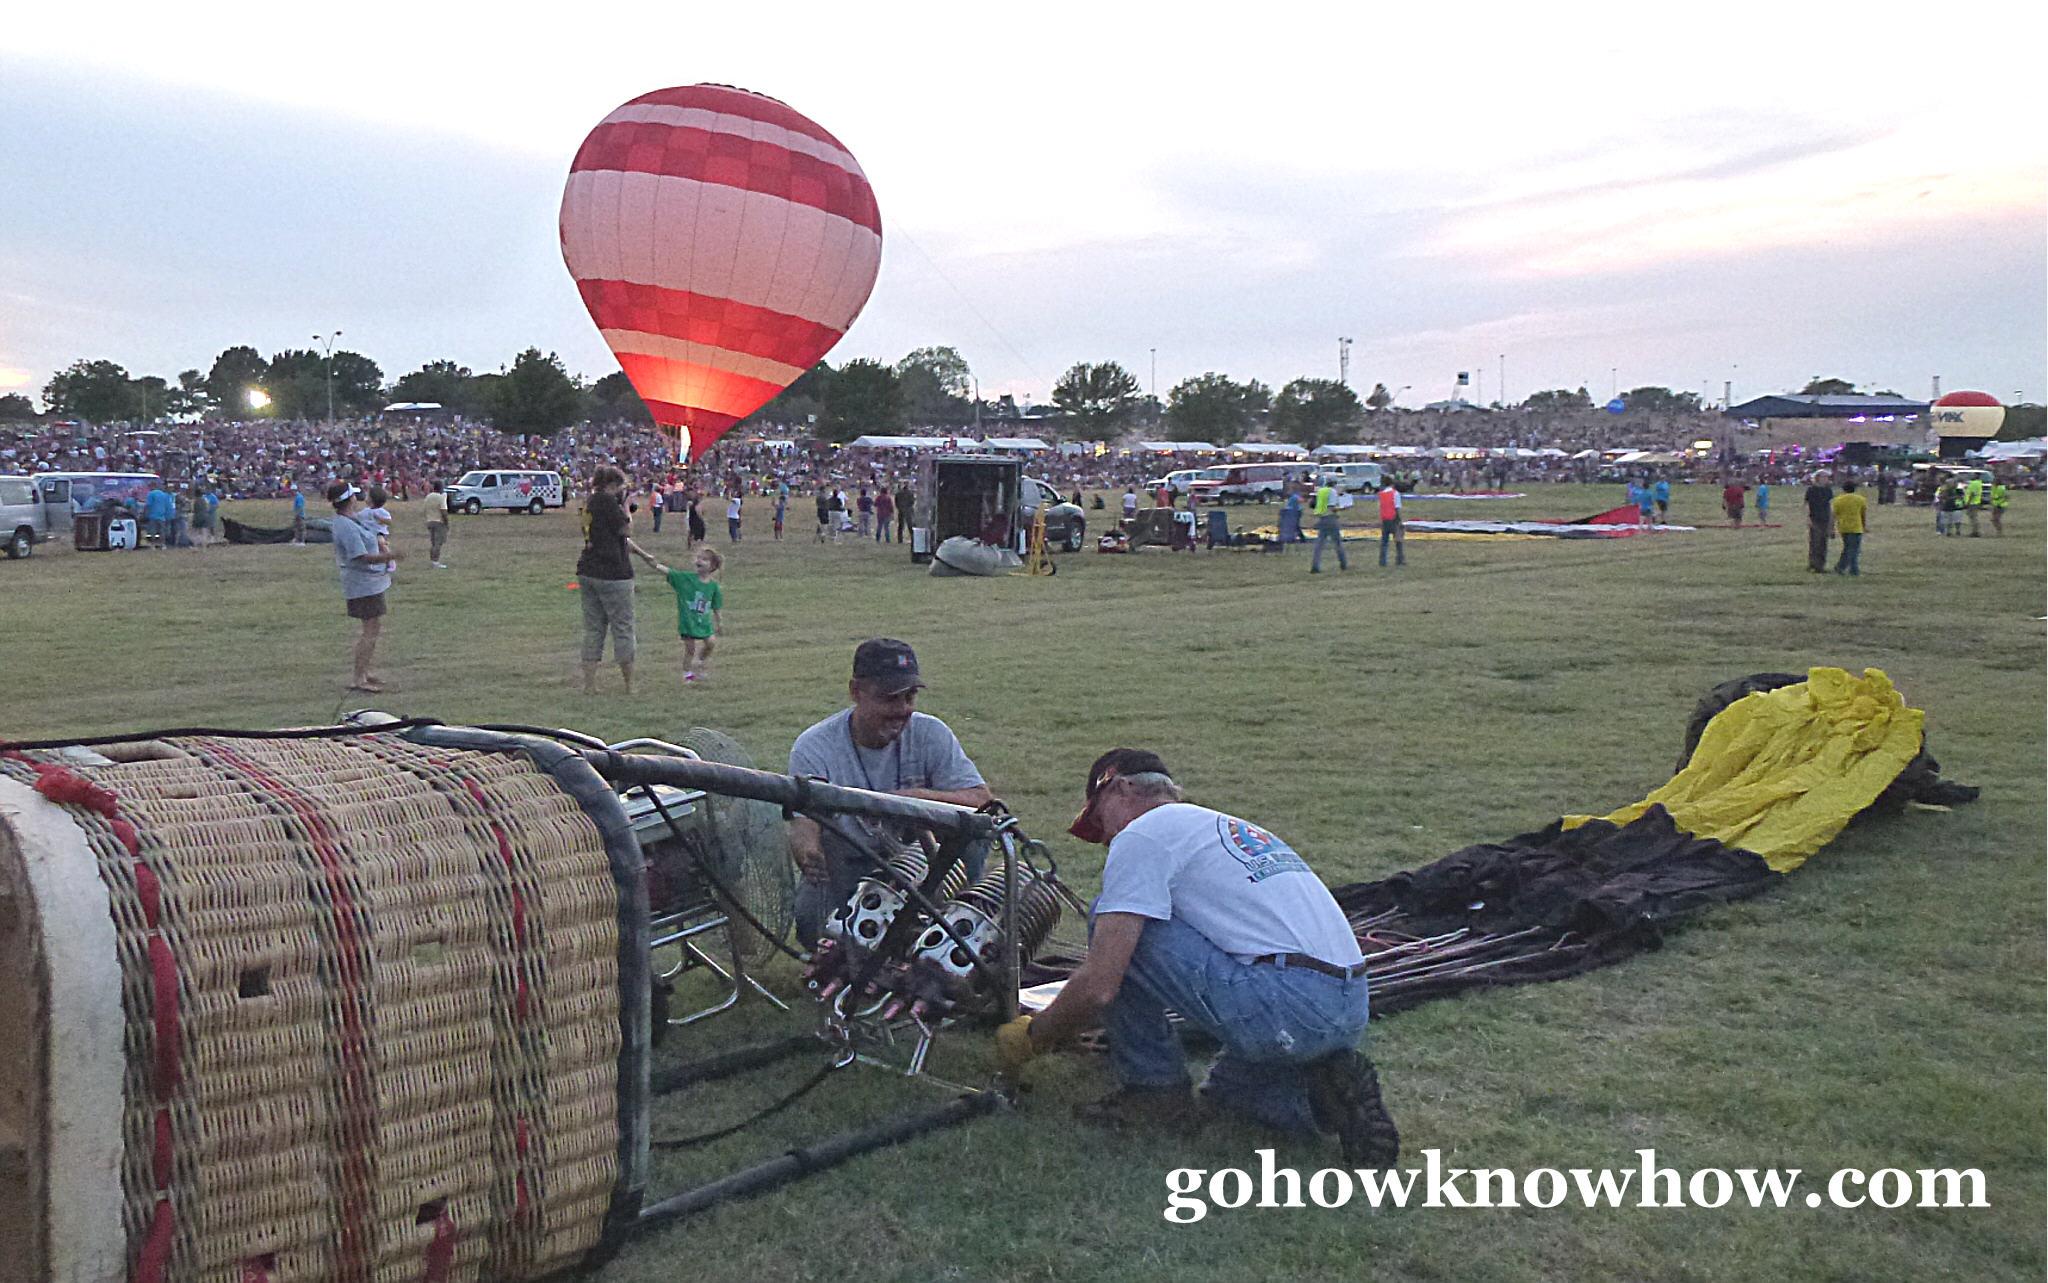 2011-09-20-planopreinflatingtheballoons.jpg